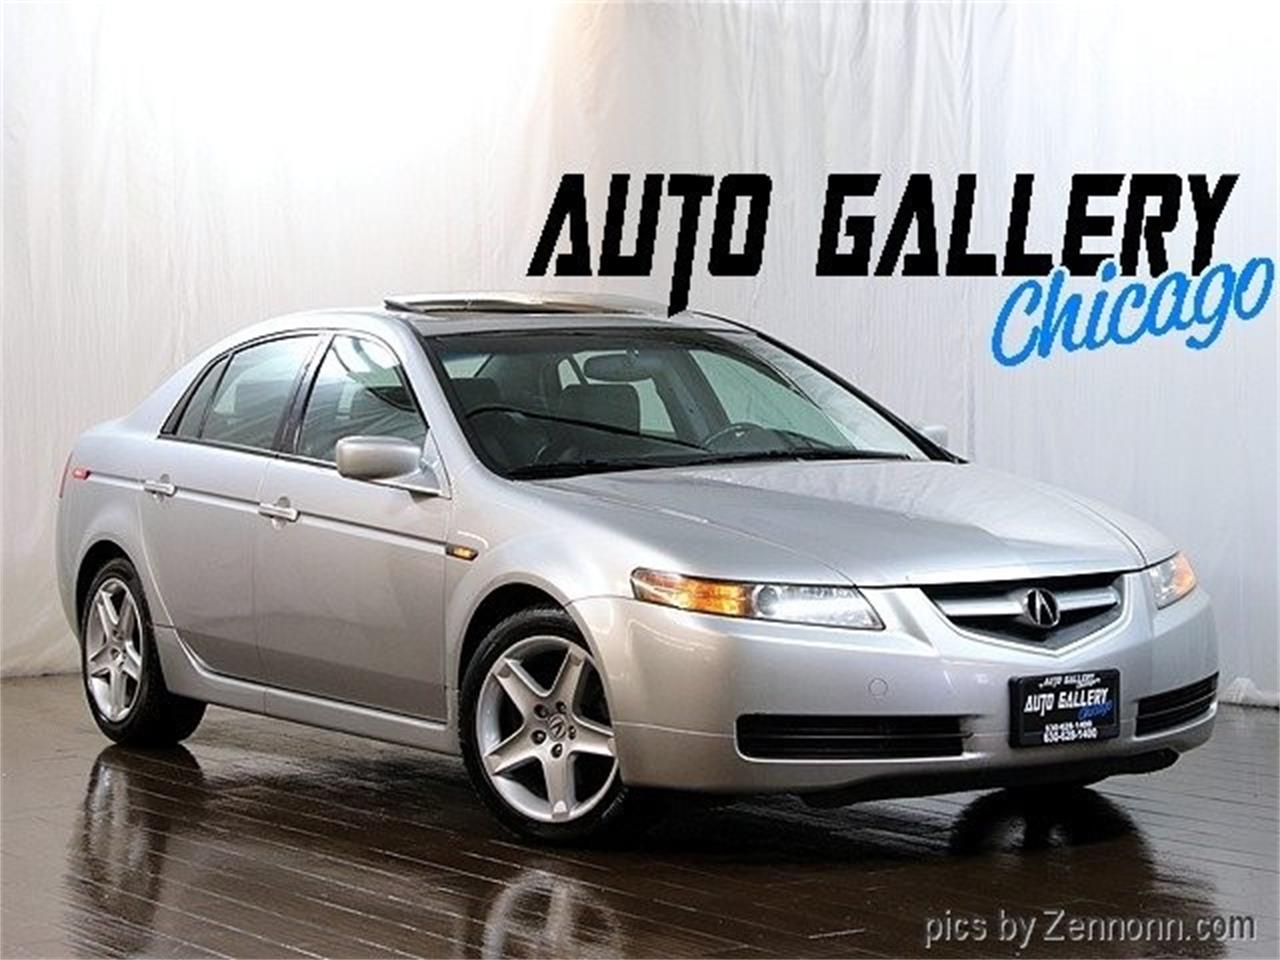 2006 Acura Tl For Sale Classiccars Com Cc 1142015